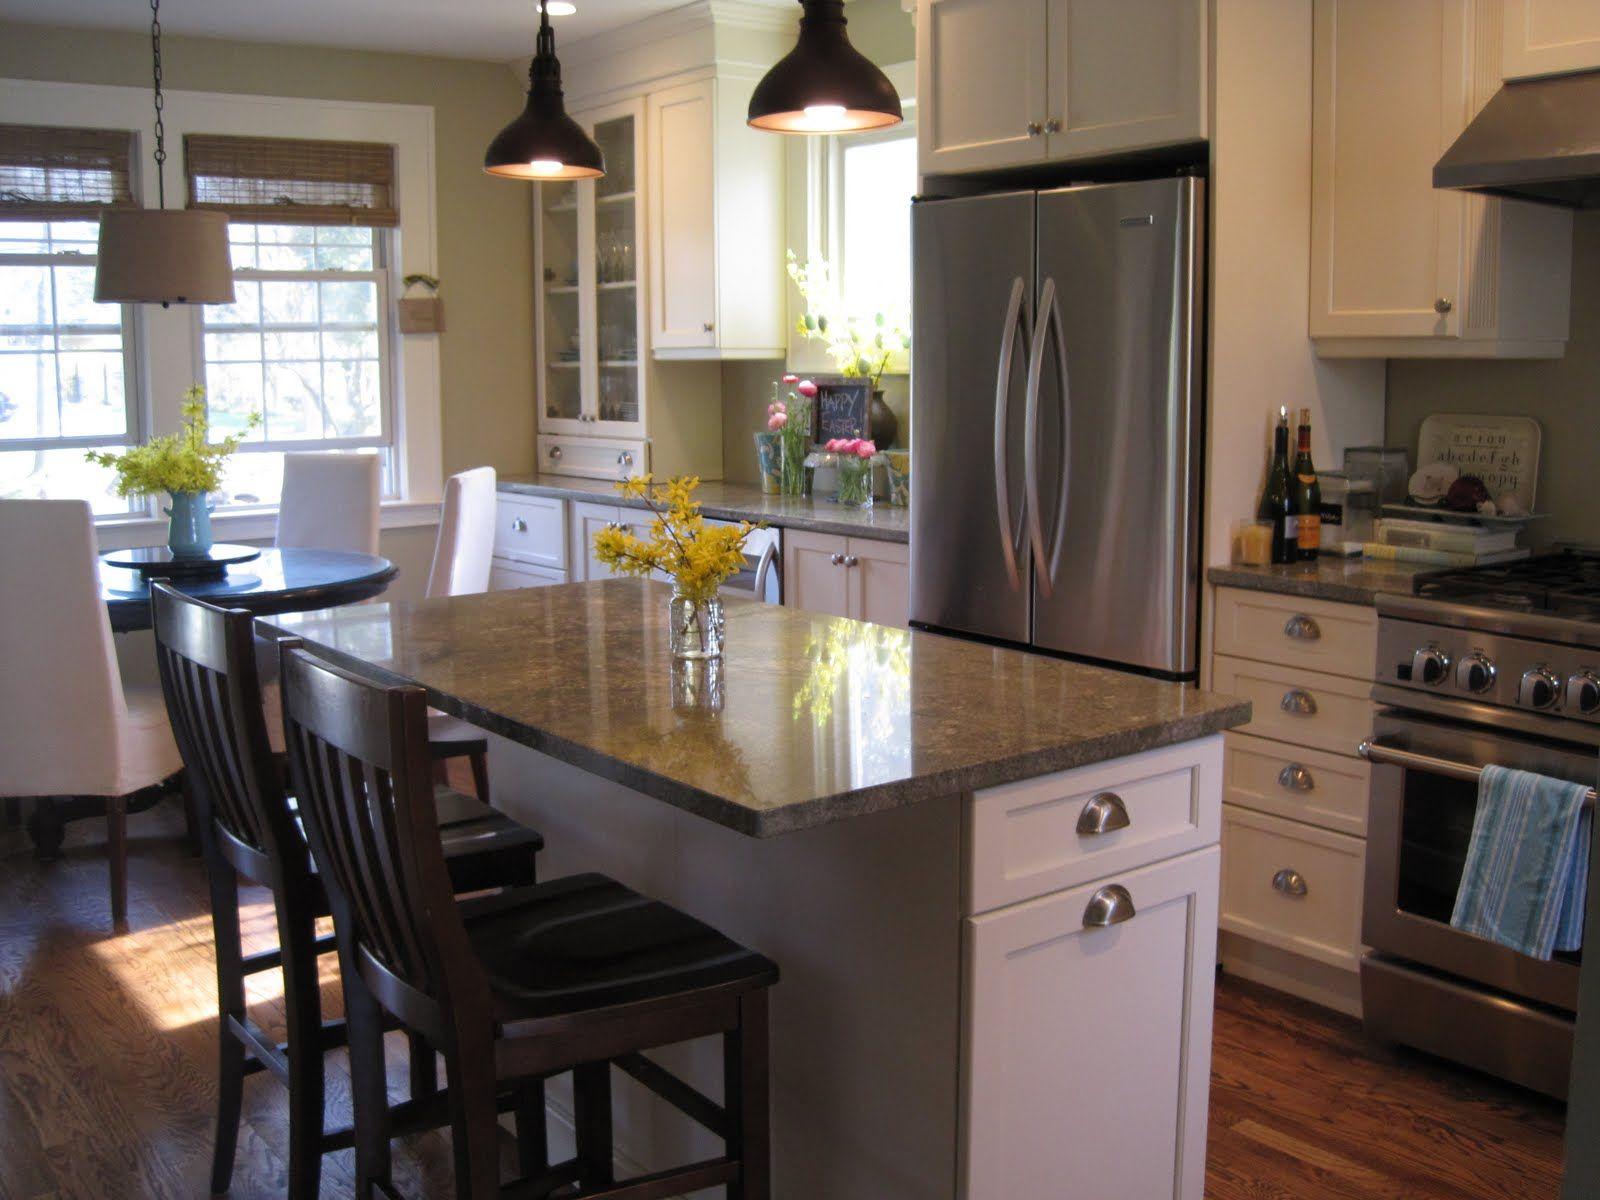 ikea kitchen island stools kitchen island with chairs Kitchen Island With Stools Drop Leaf Breakfast Bar Top Kitchen